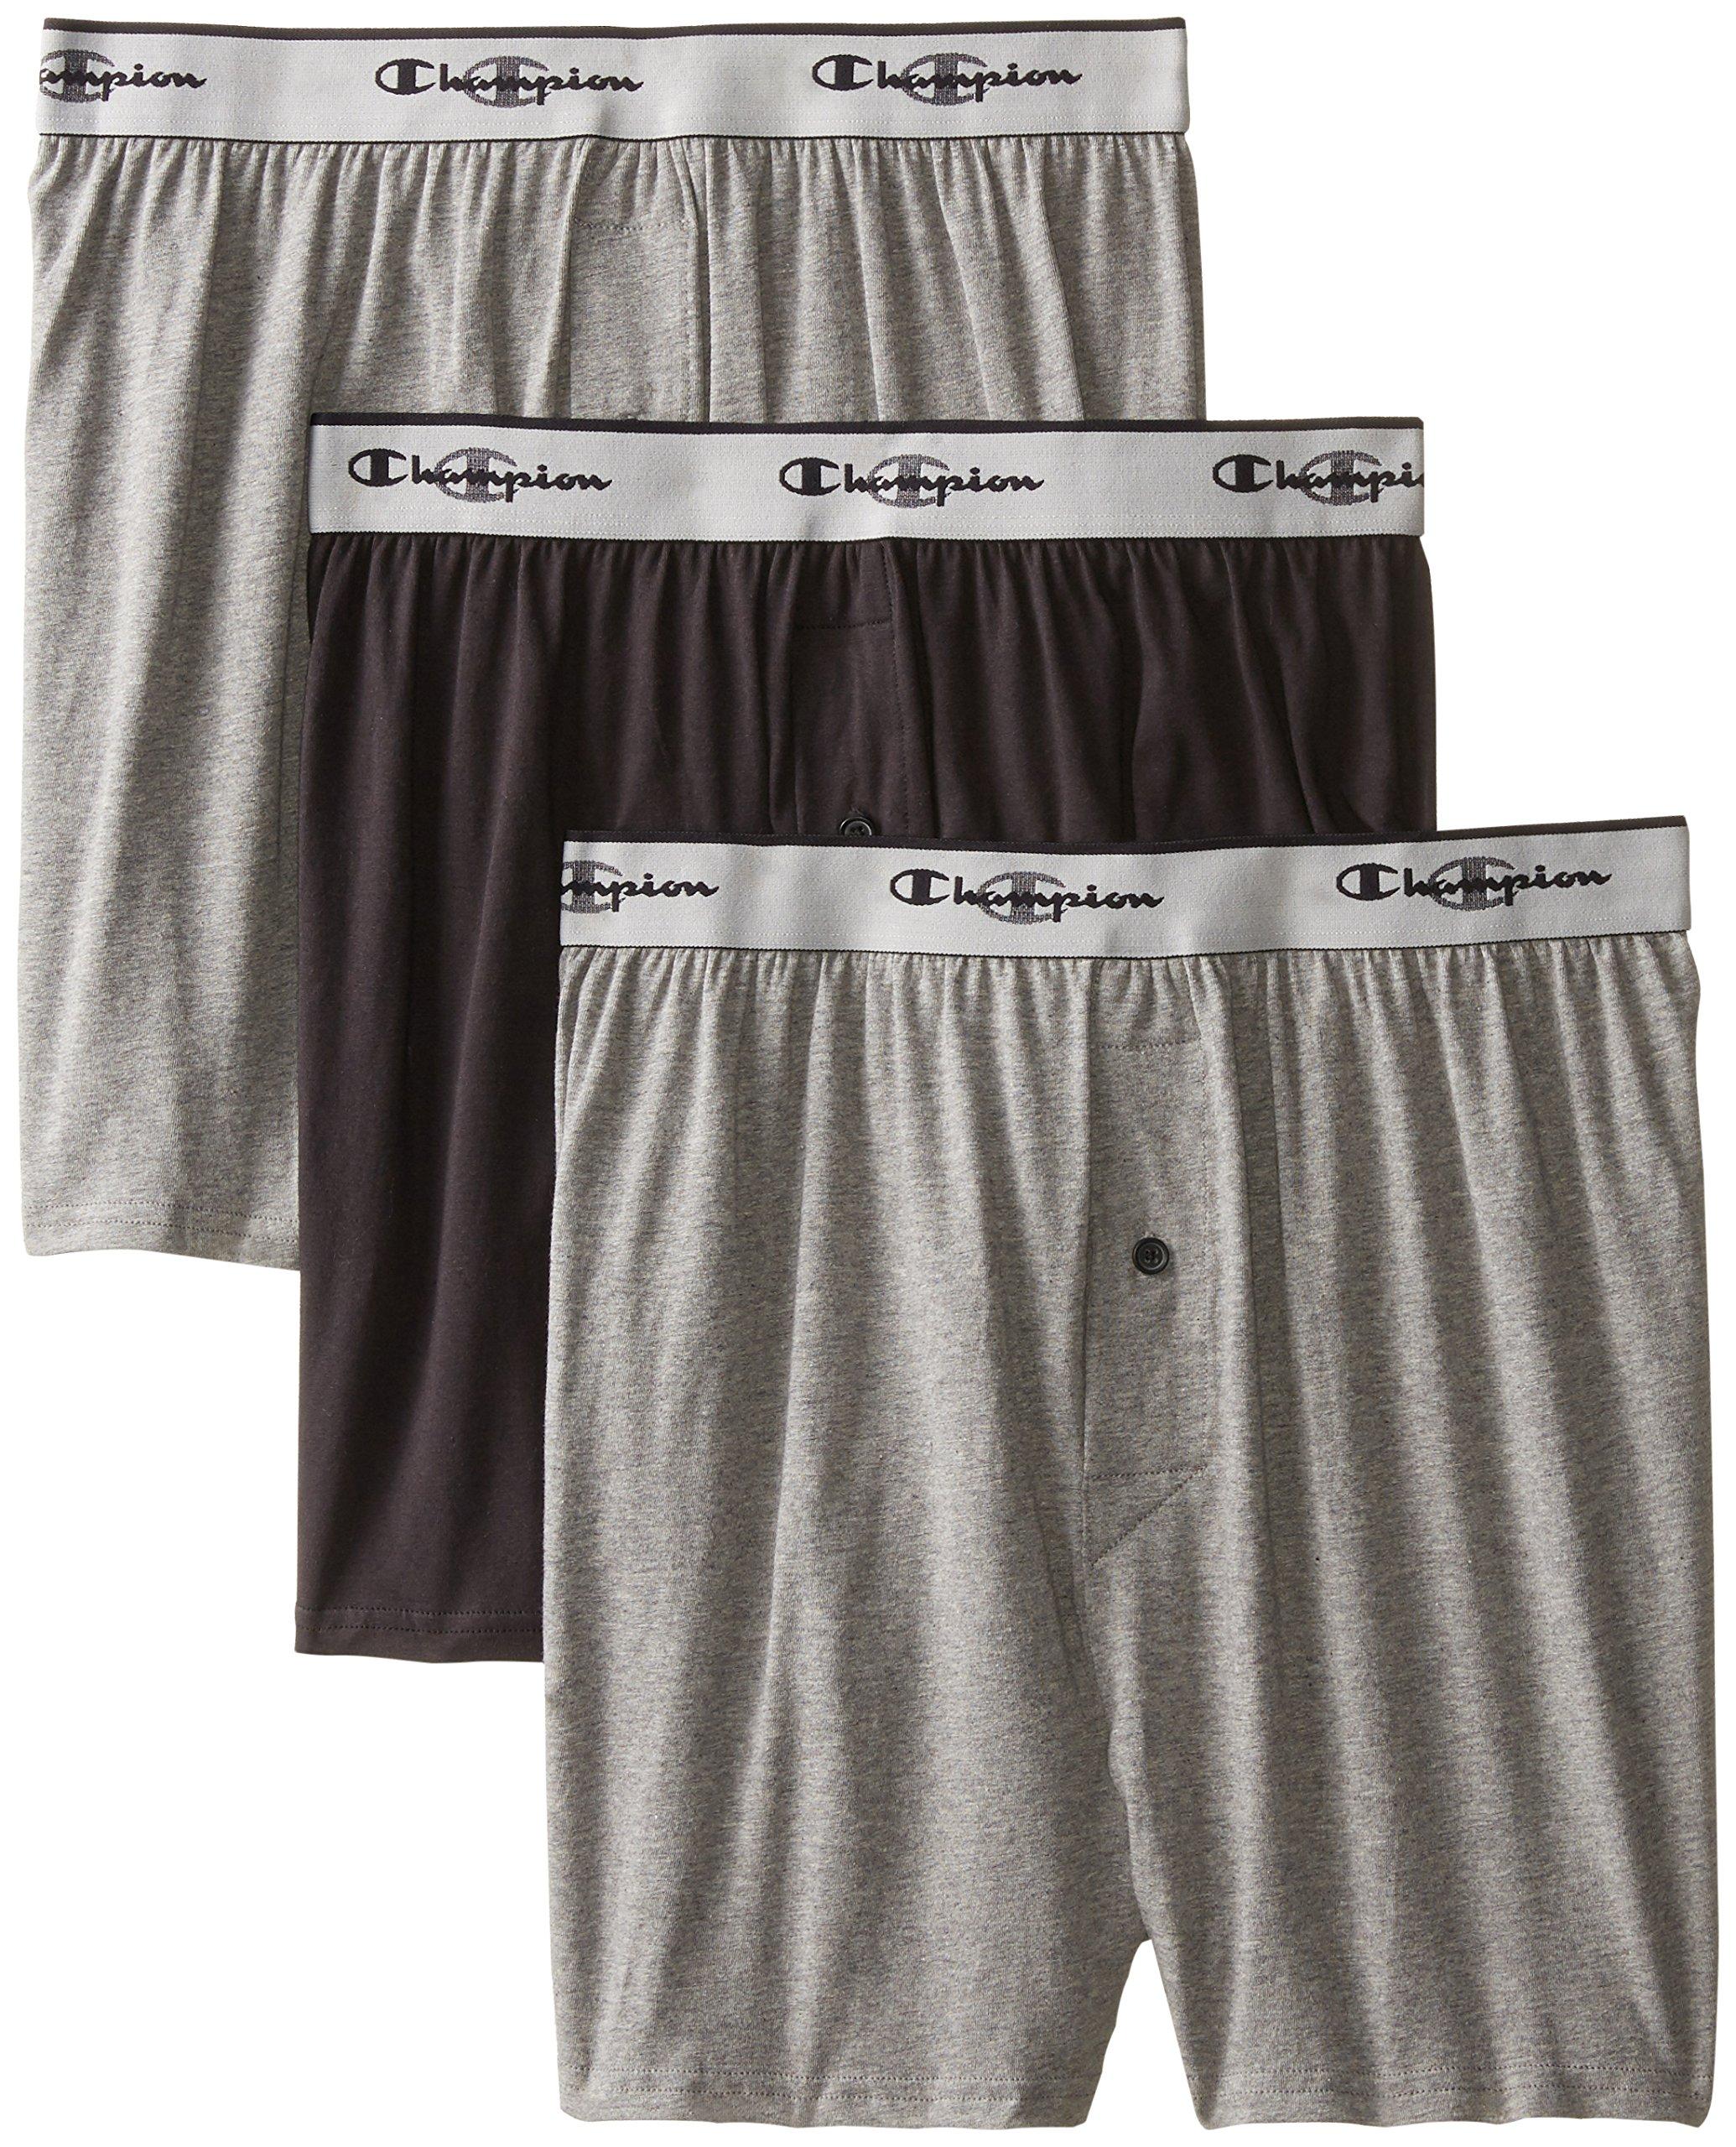 Champion Men's 3-Pack Knit Boxer, Gray/Black, X-Large